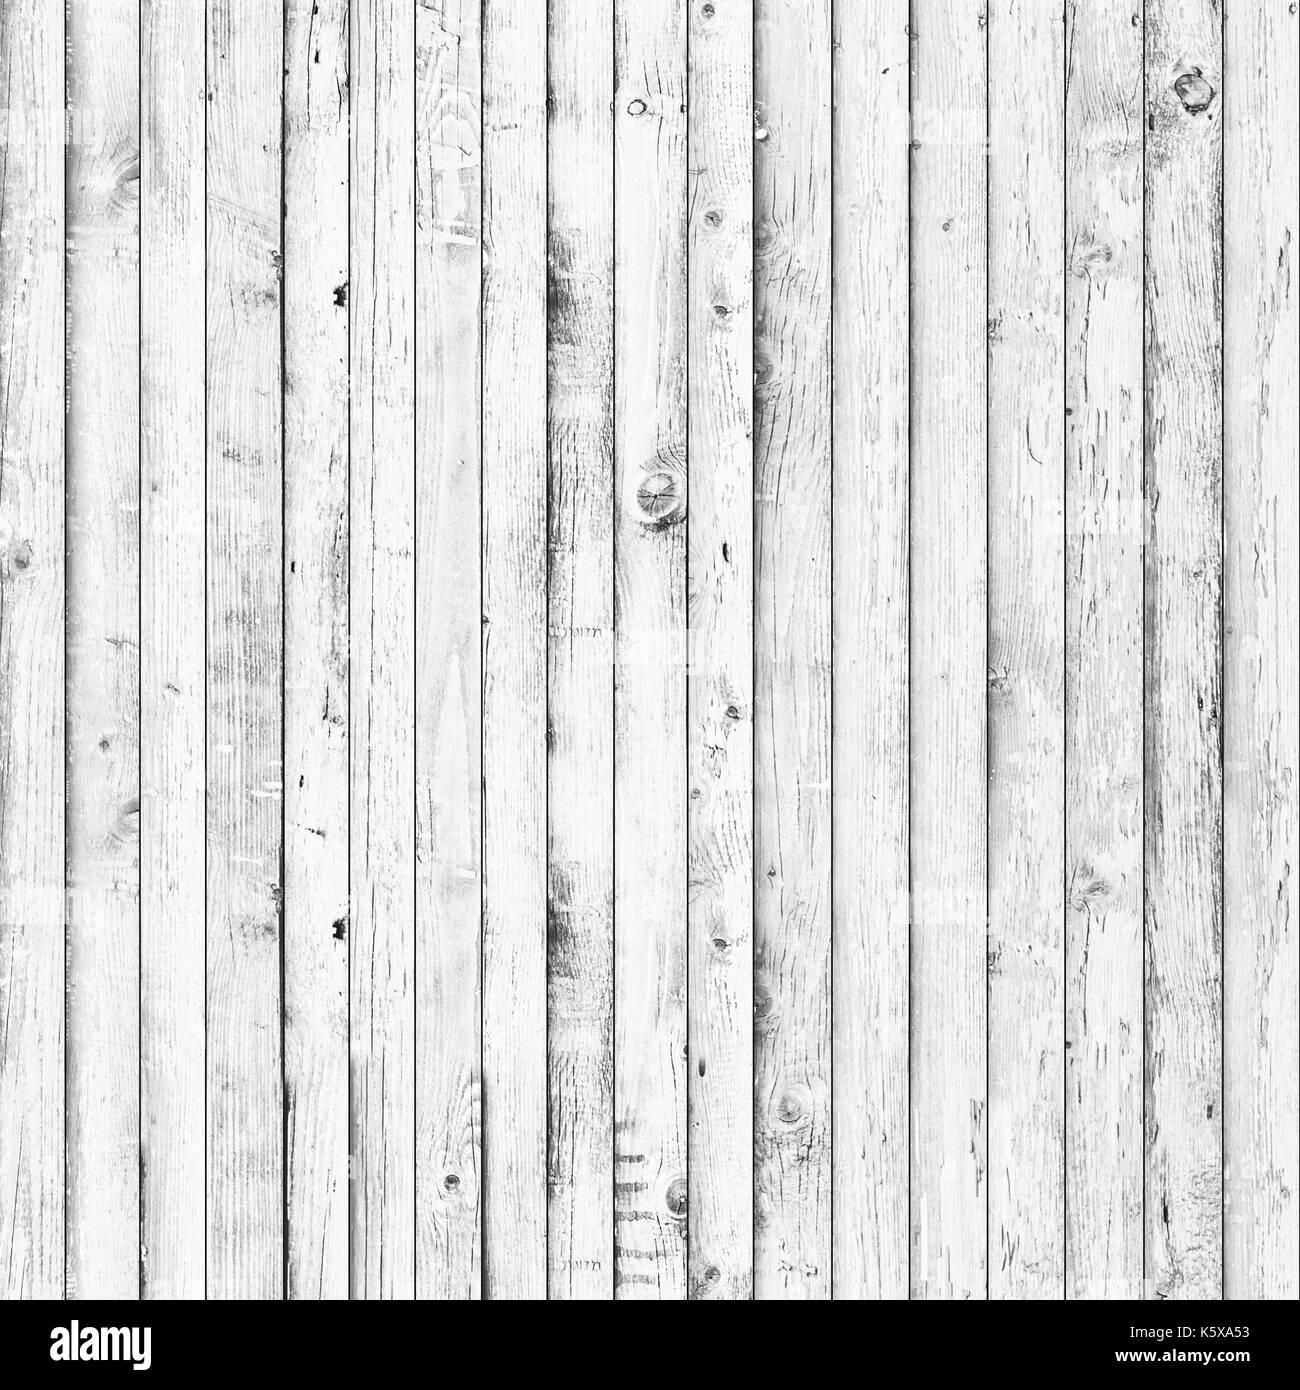 Vintage tiled wood texture - Stock Image